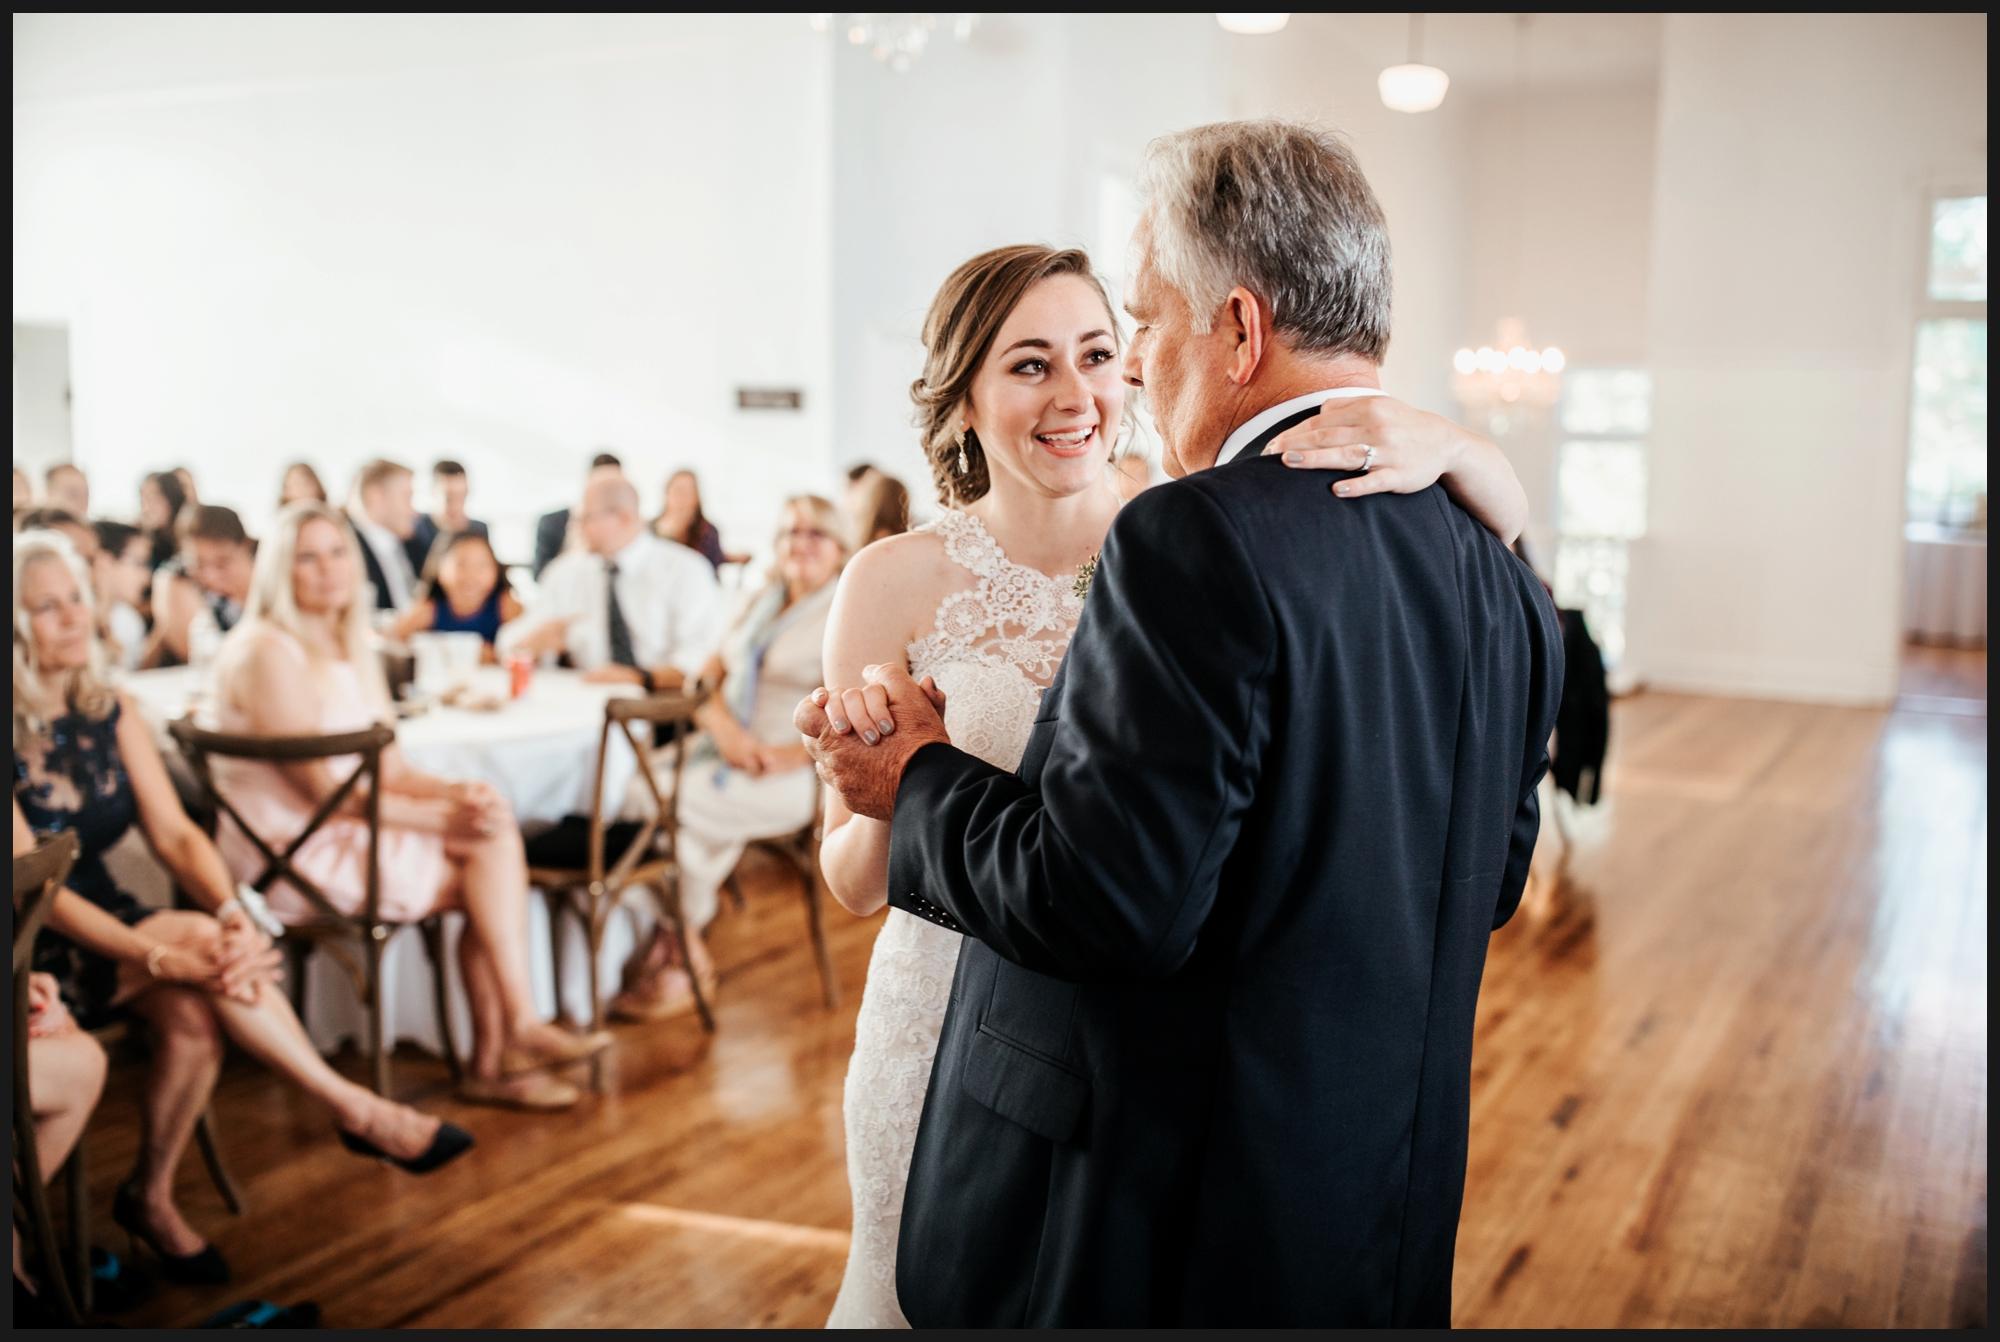 Orlando-Wedding-Photographer-destination-wedding-photographer-florida-wedding-photographer-bohemian-wedding-photographer_1777.jpg